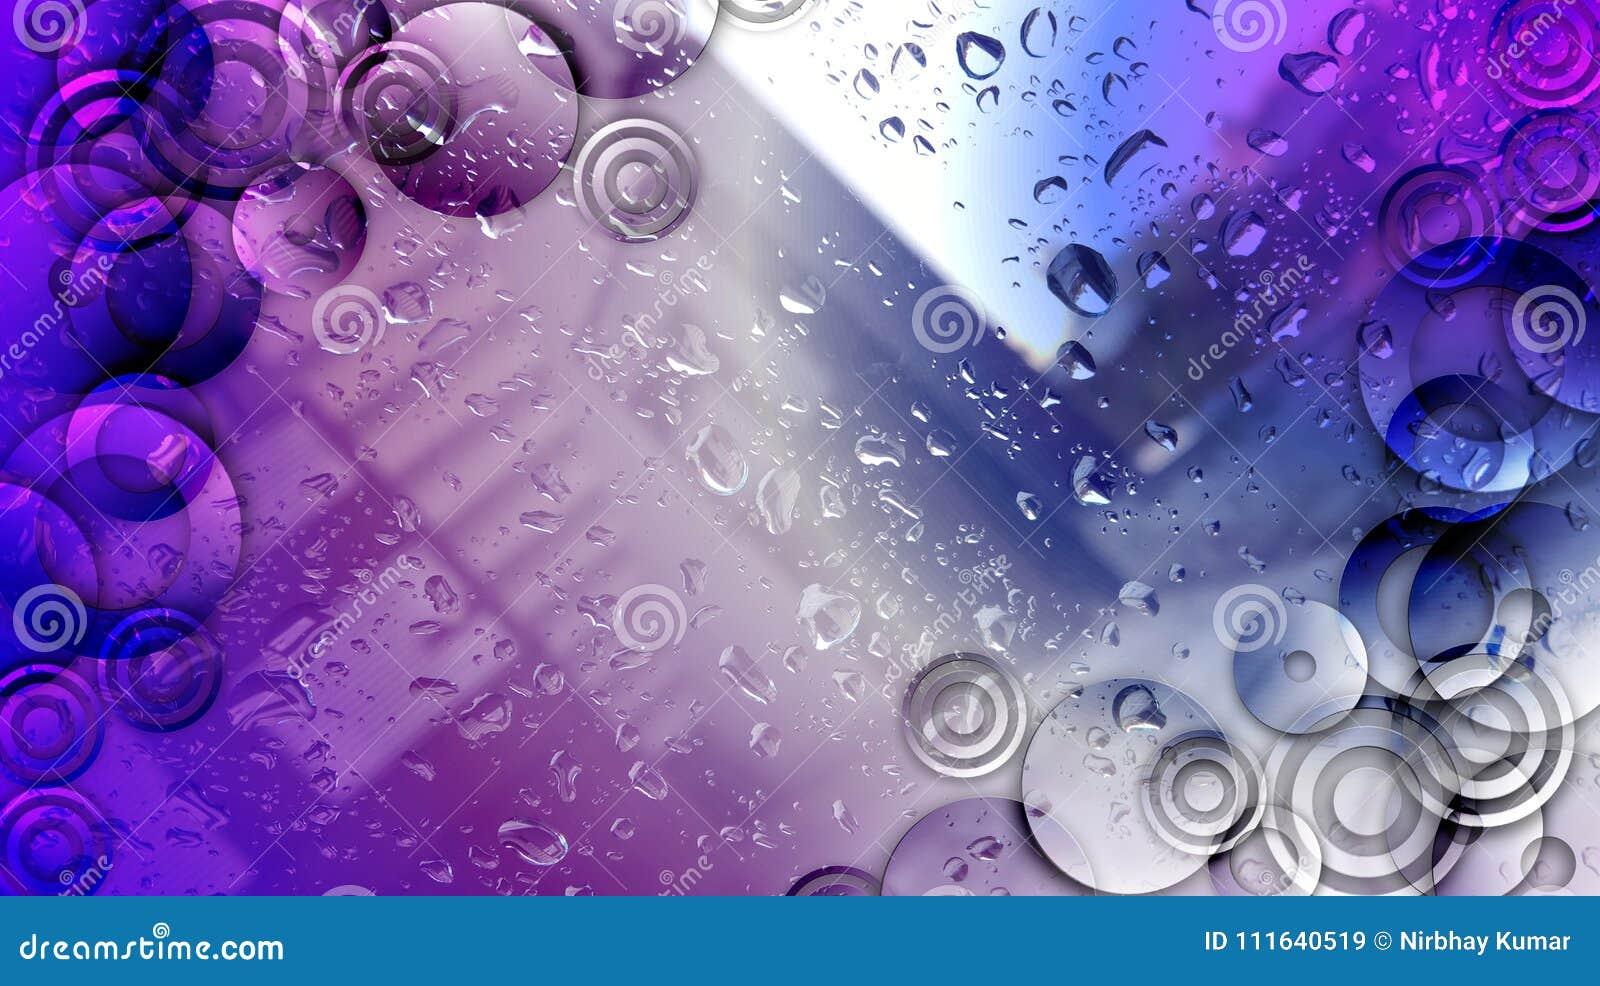 modern ultra violet bright background stock vector illustration of